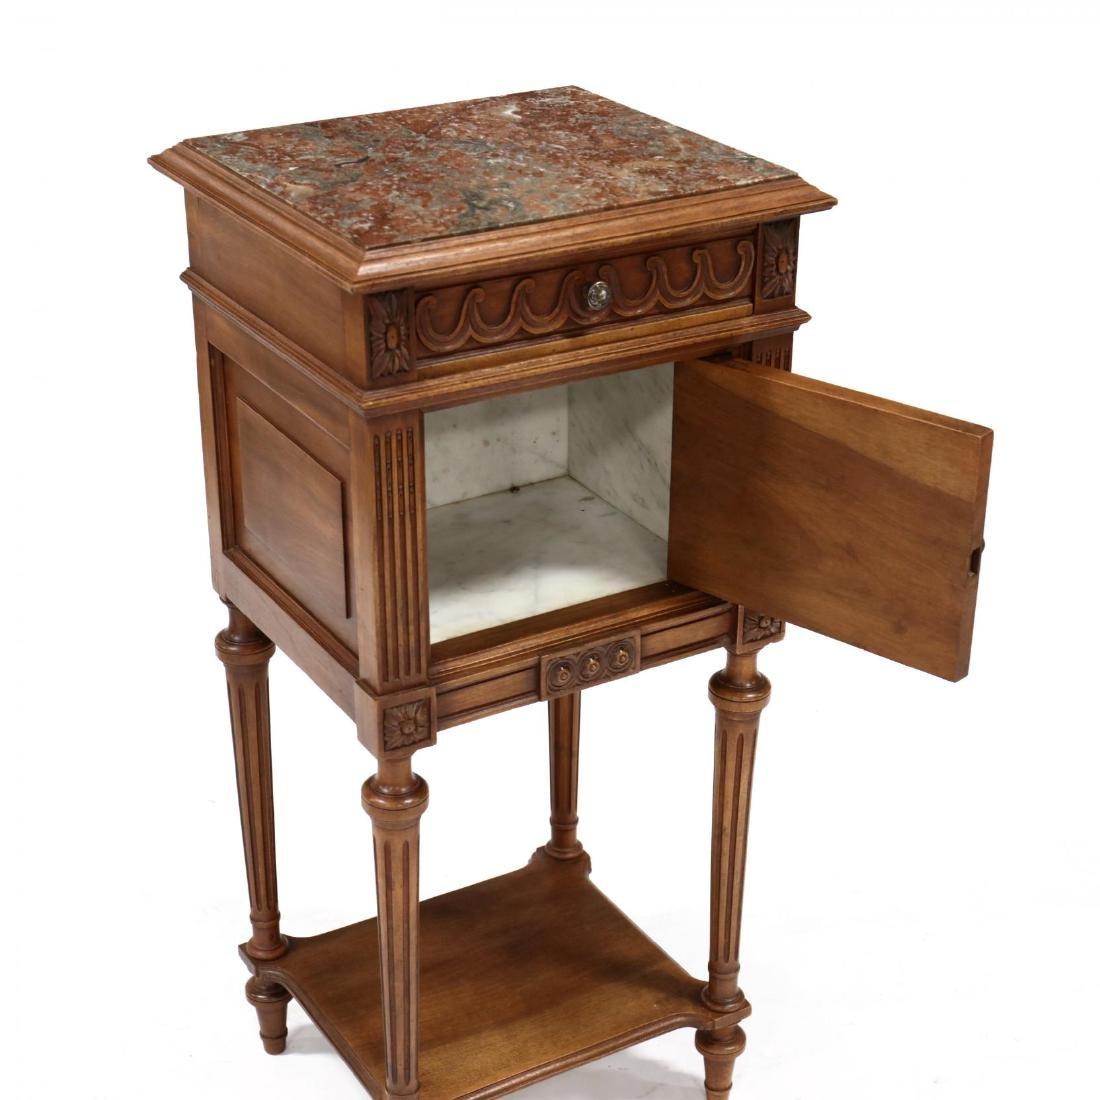 Louis XVI Style Marble Top Smoking Stand - 3